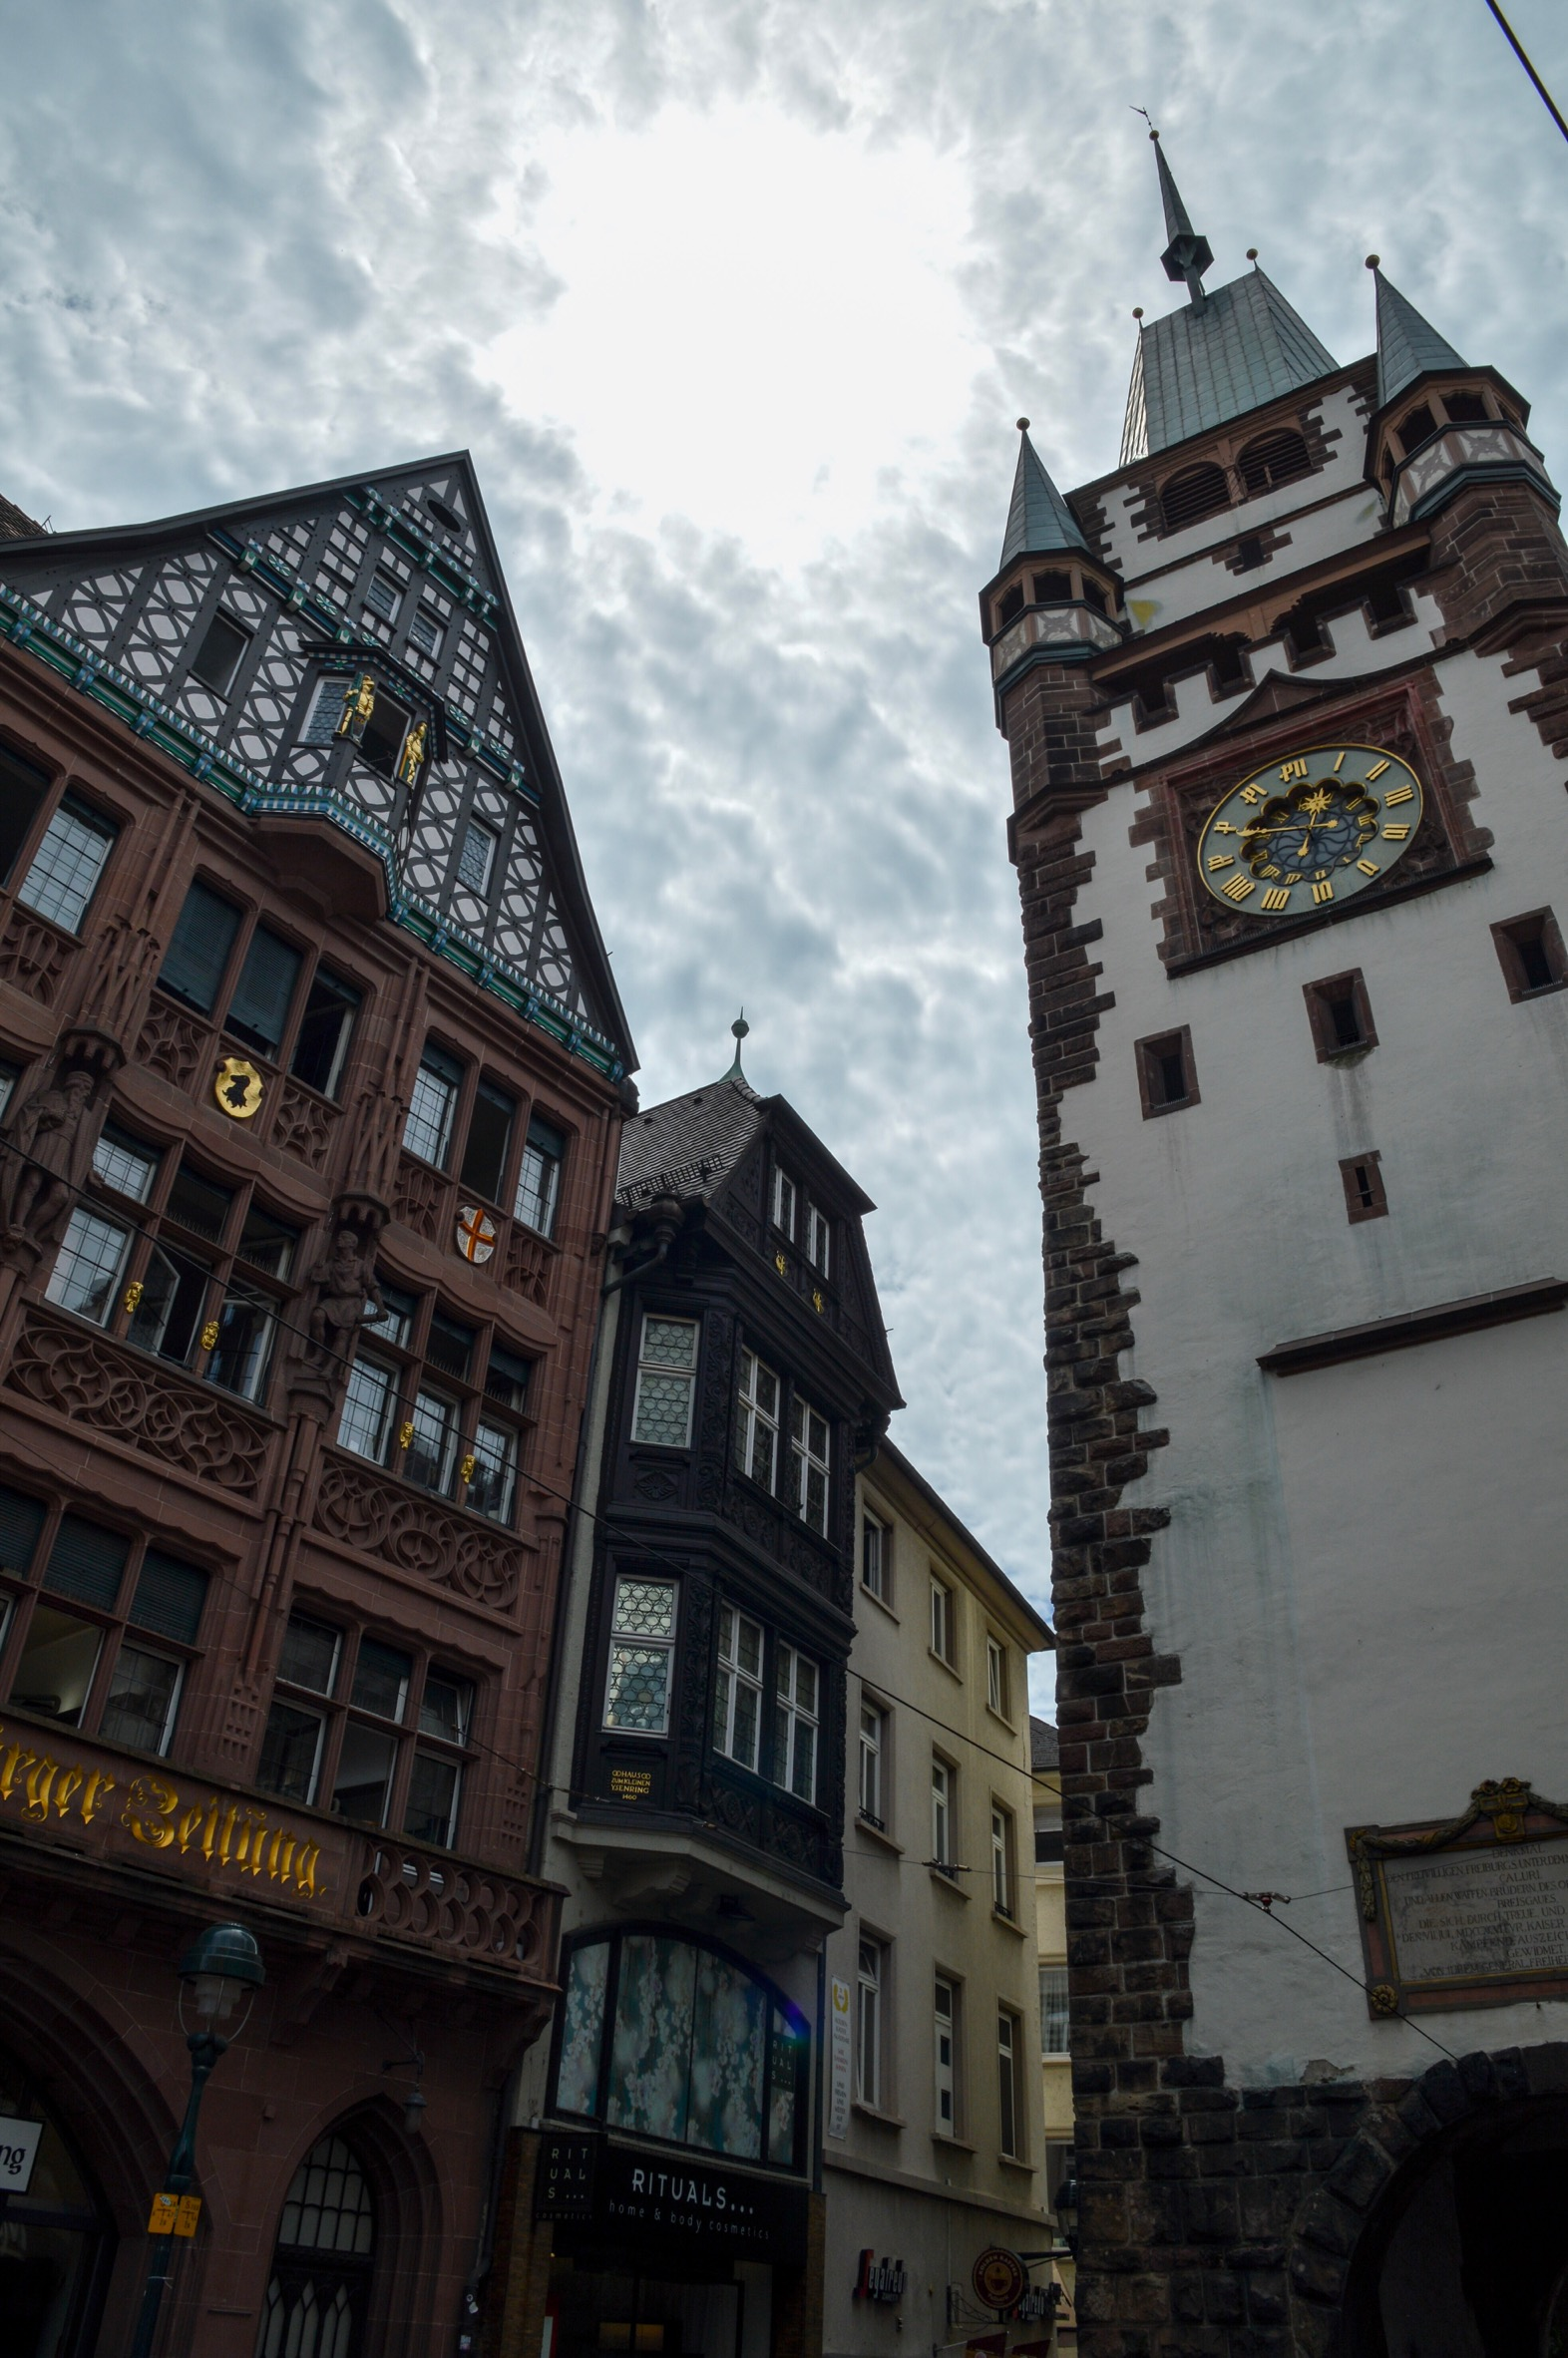 Martinstor, Freiburg, Germany